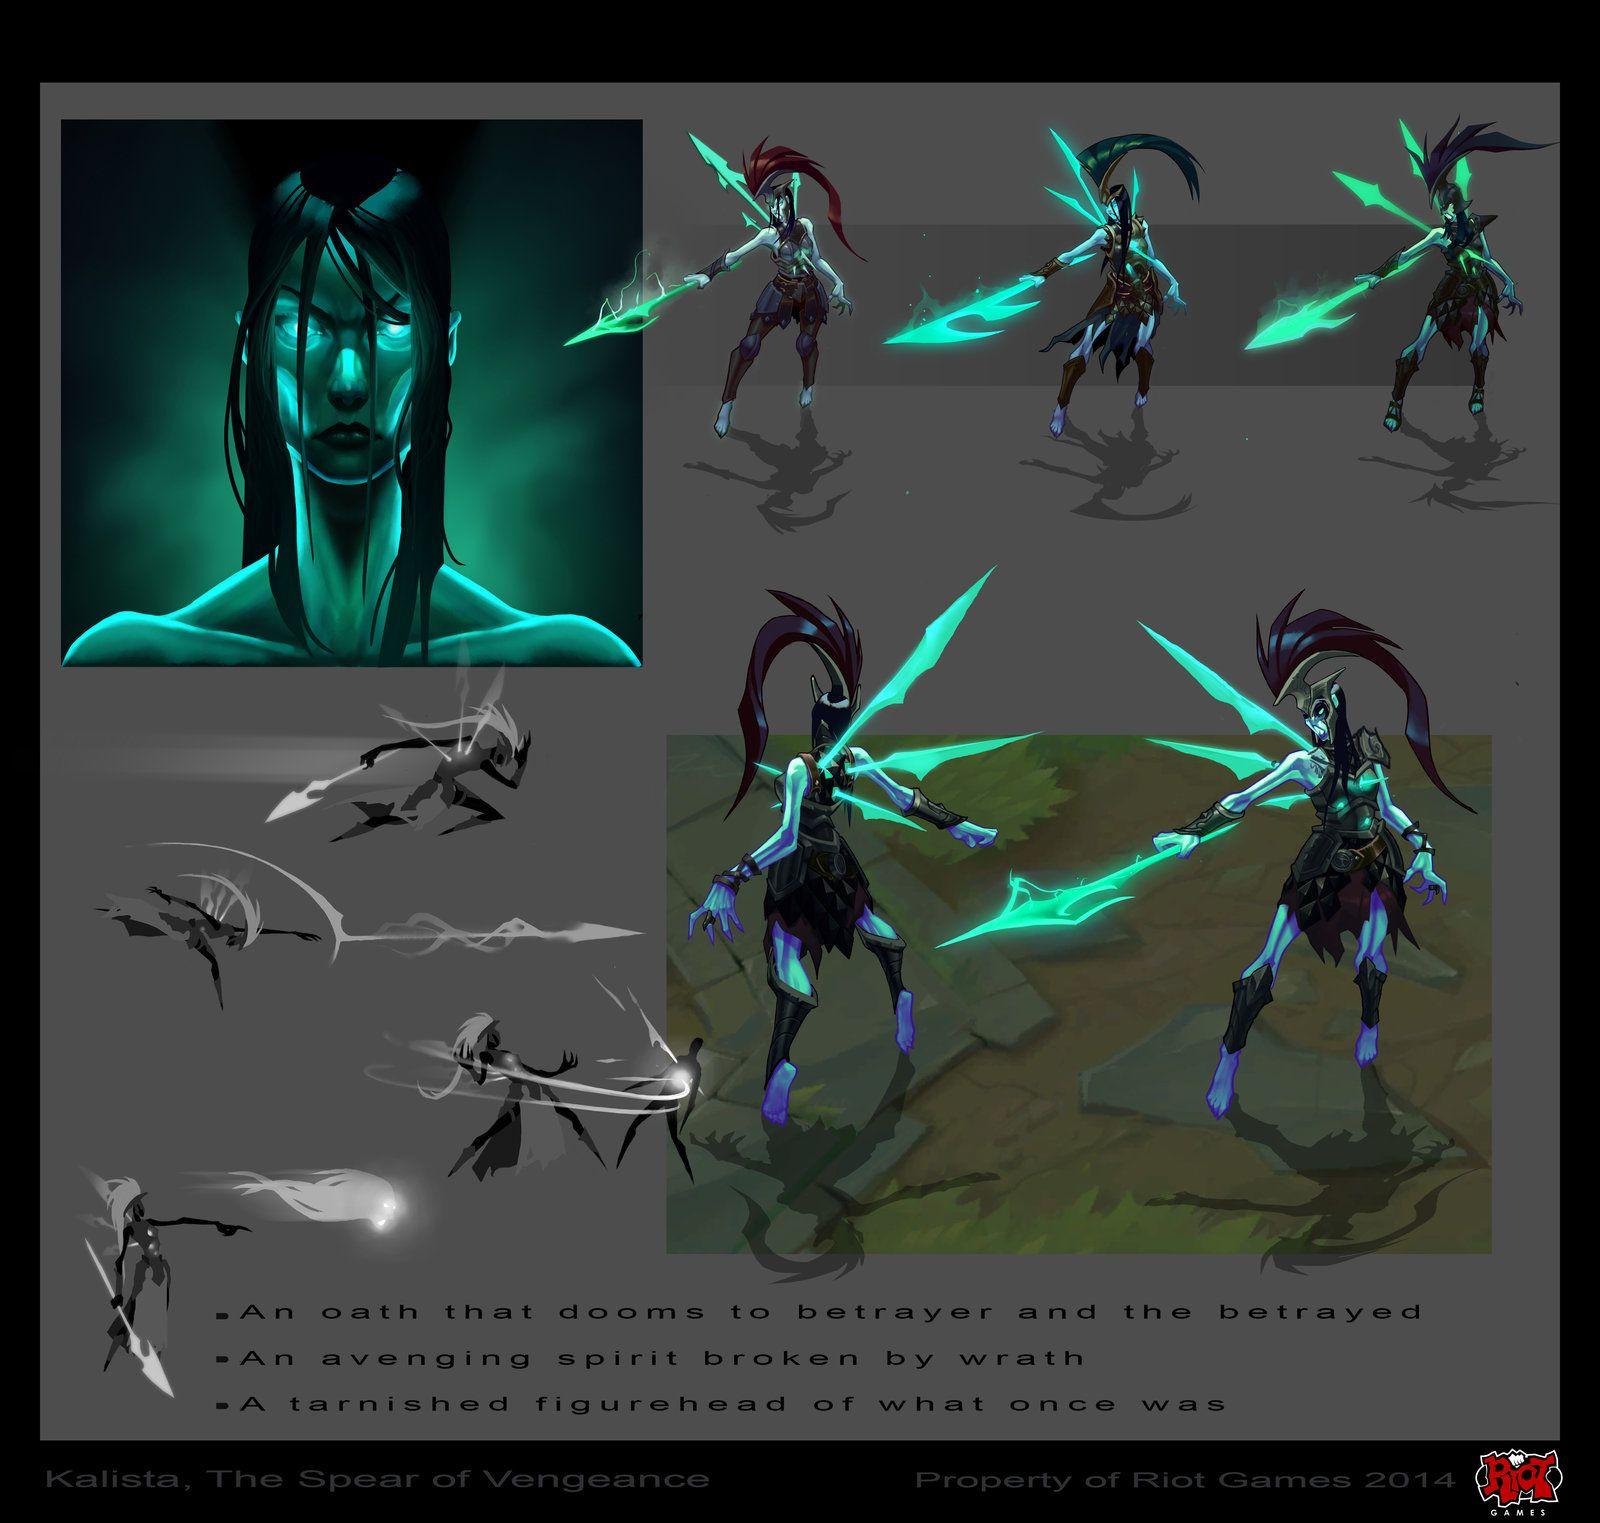 league of legends character concept art - Google Search